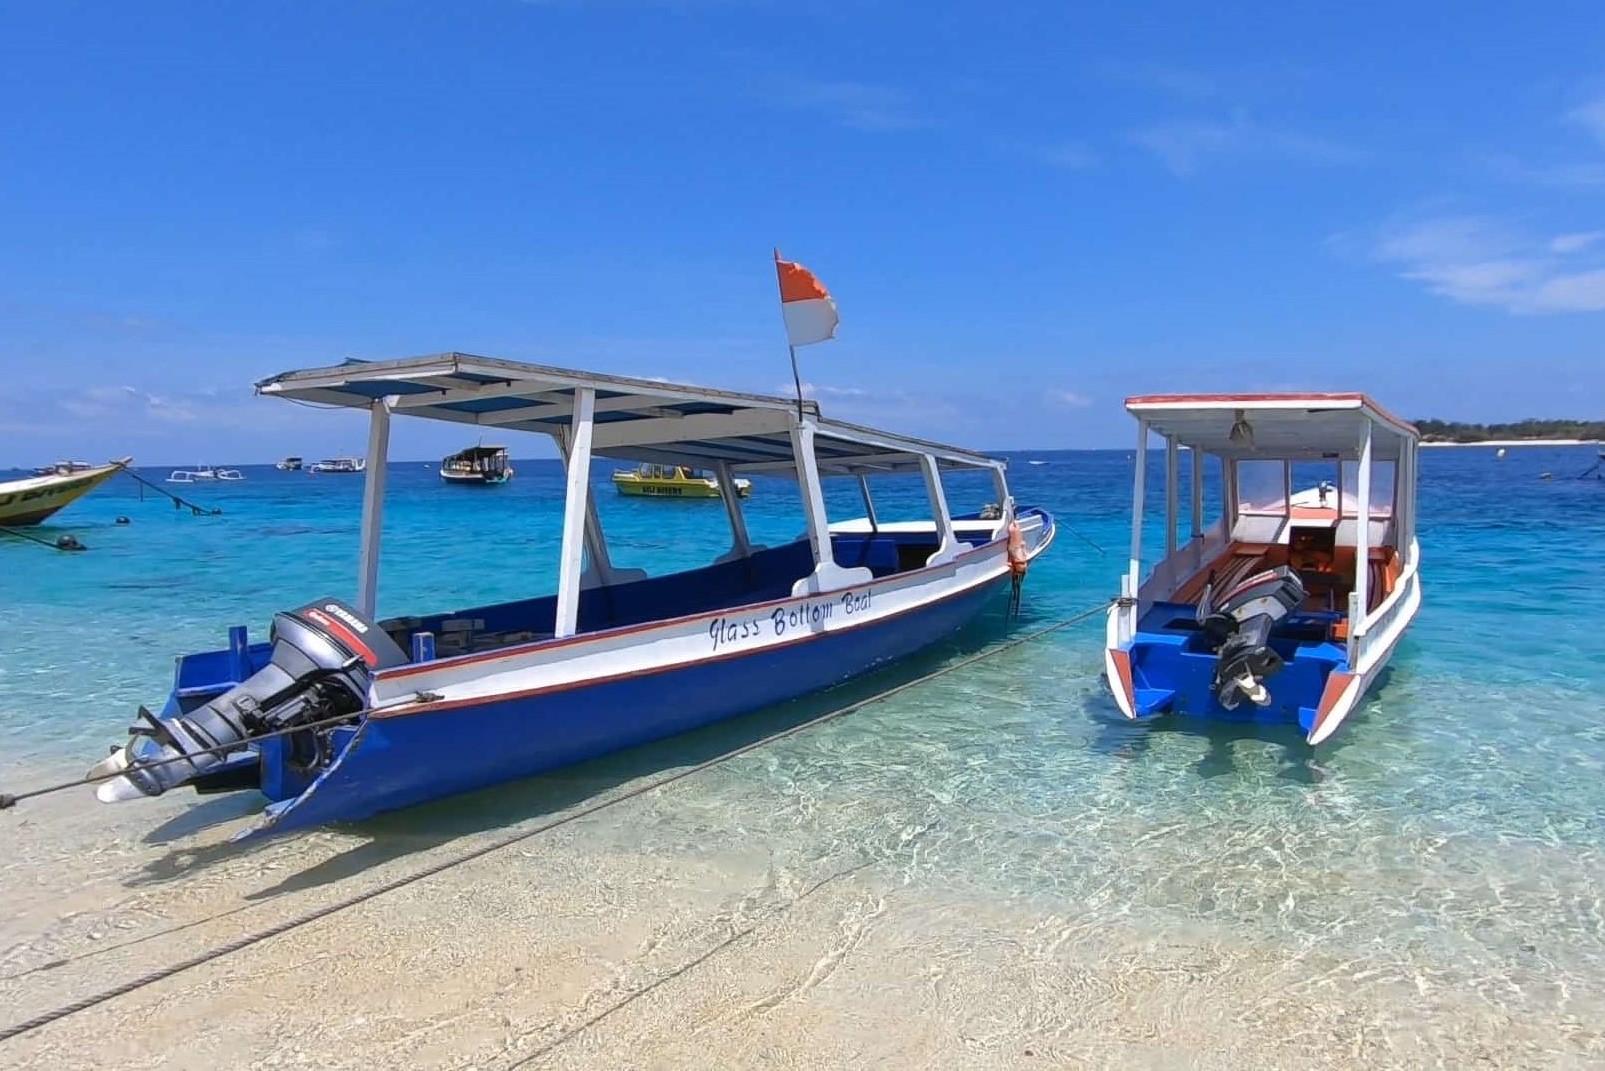 Wyspy Gili Air Gili Trawangan Gili Meno